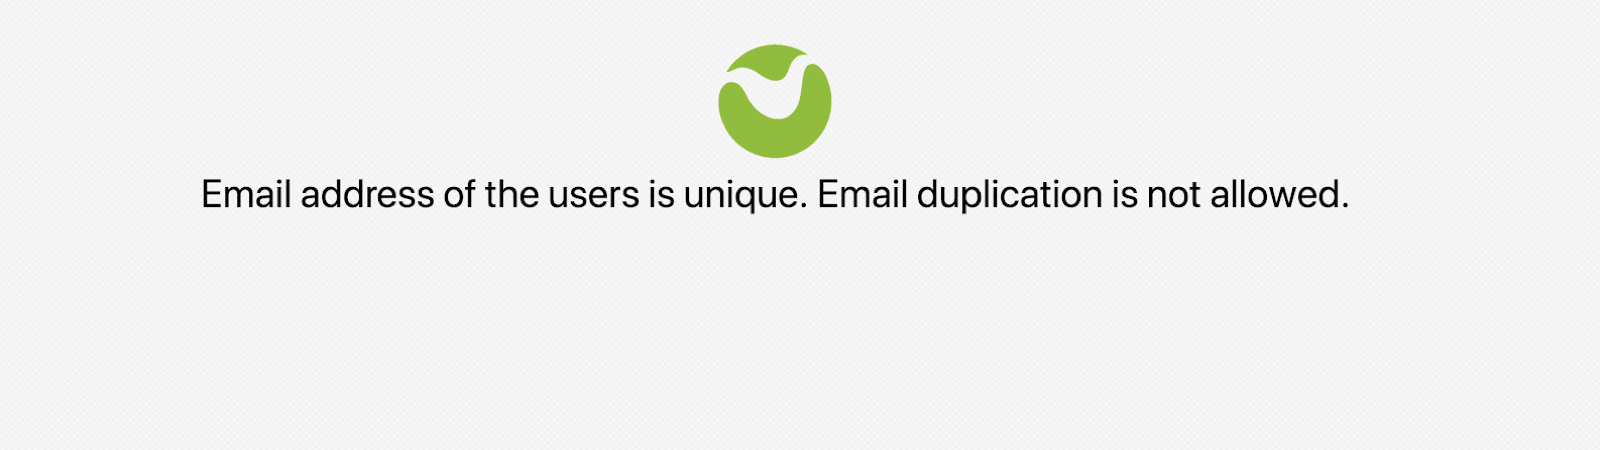 duplicate email address error message